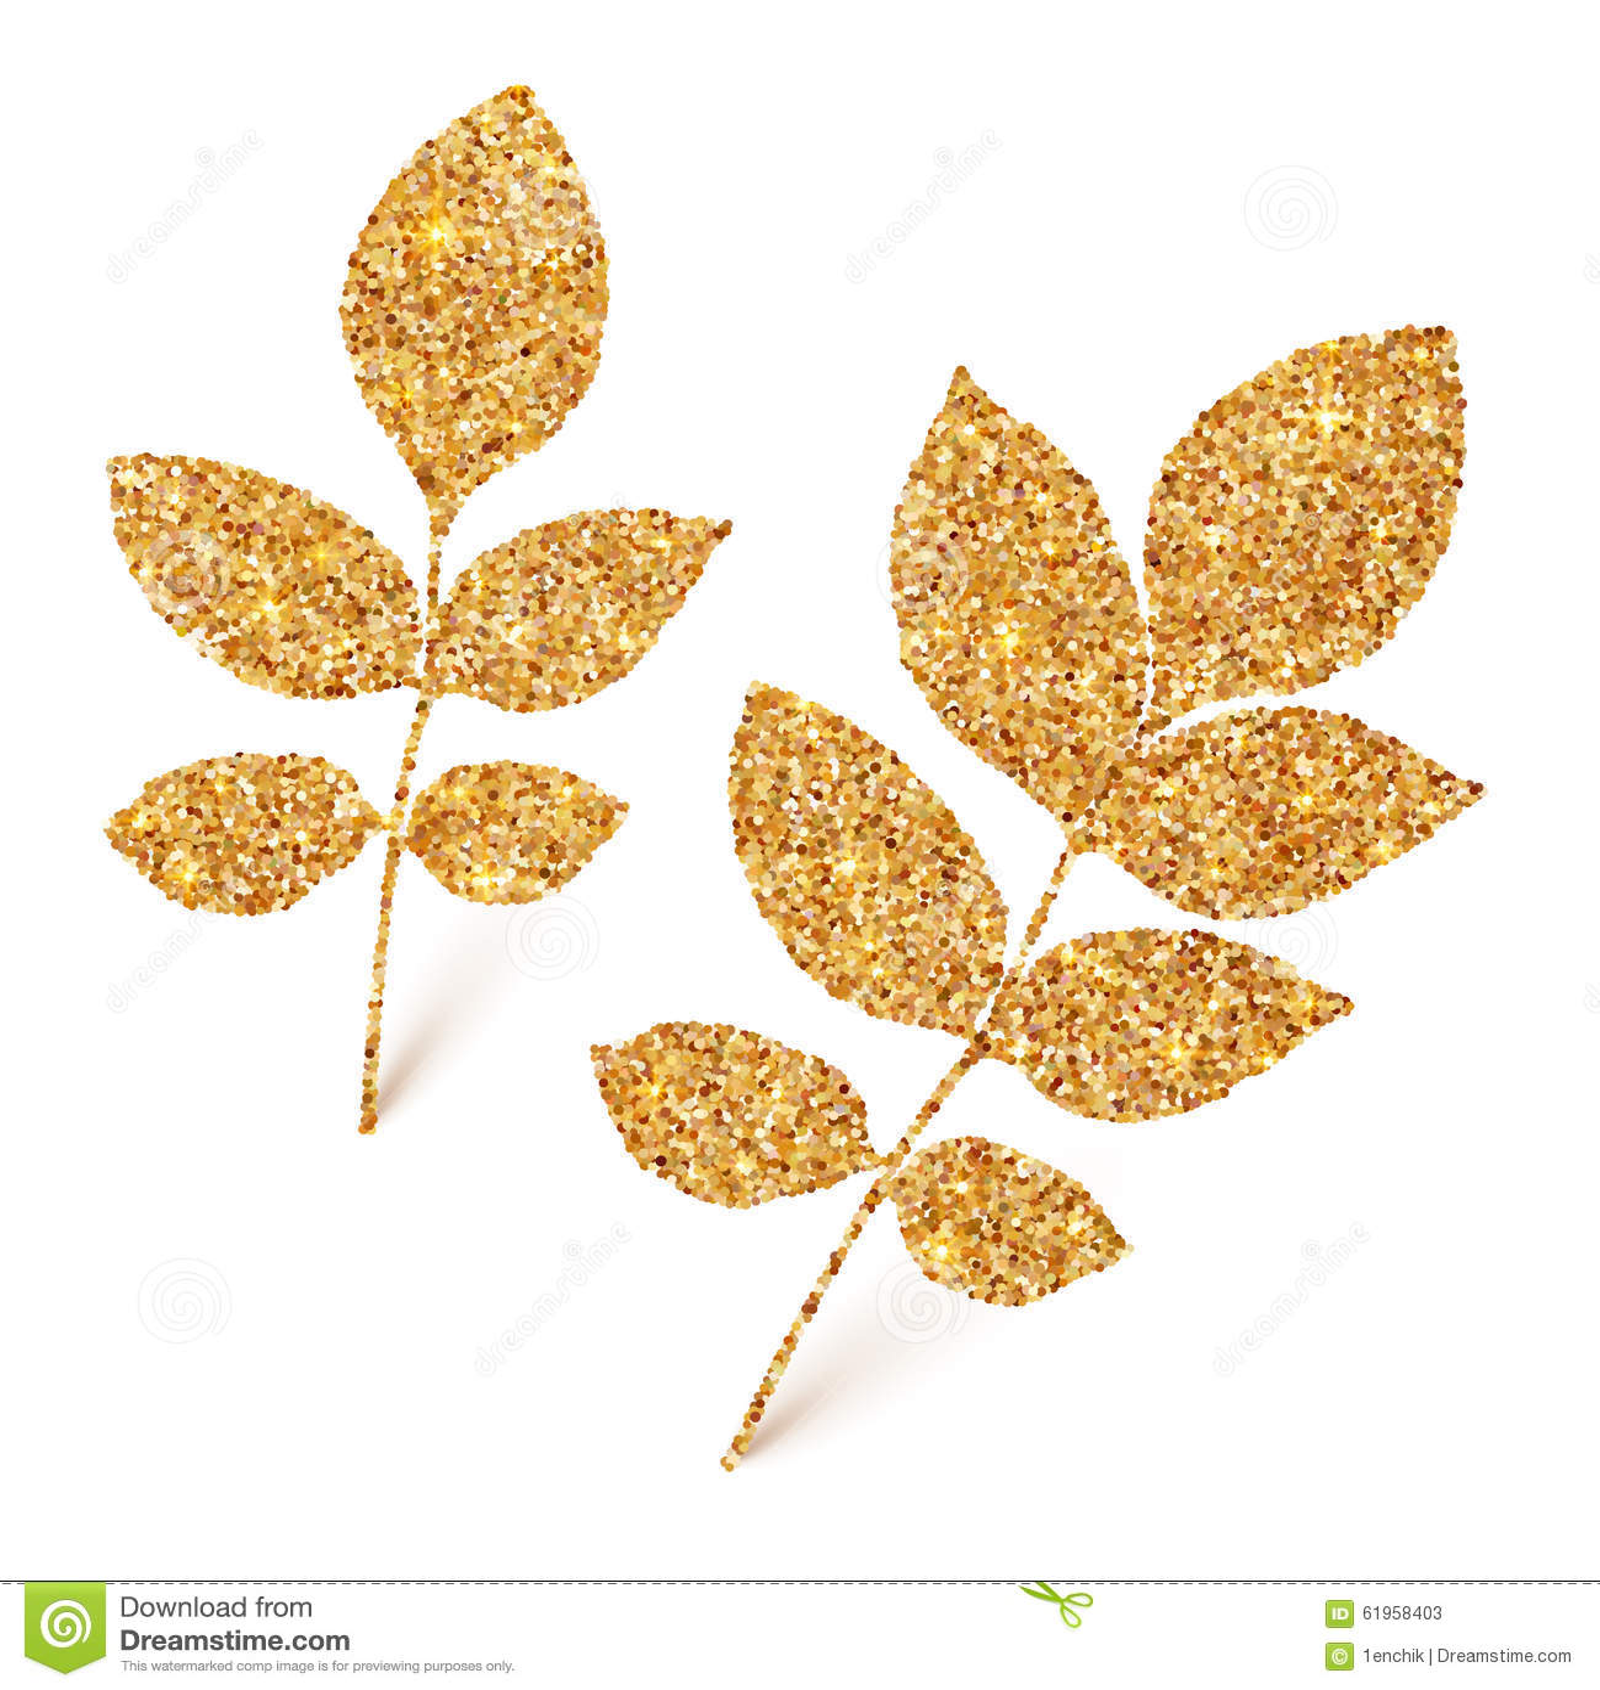 Fall Leaves Iphone 5 Wallpaper Golden Glitter Leaves Isolated On White Background Stock